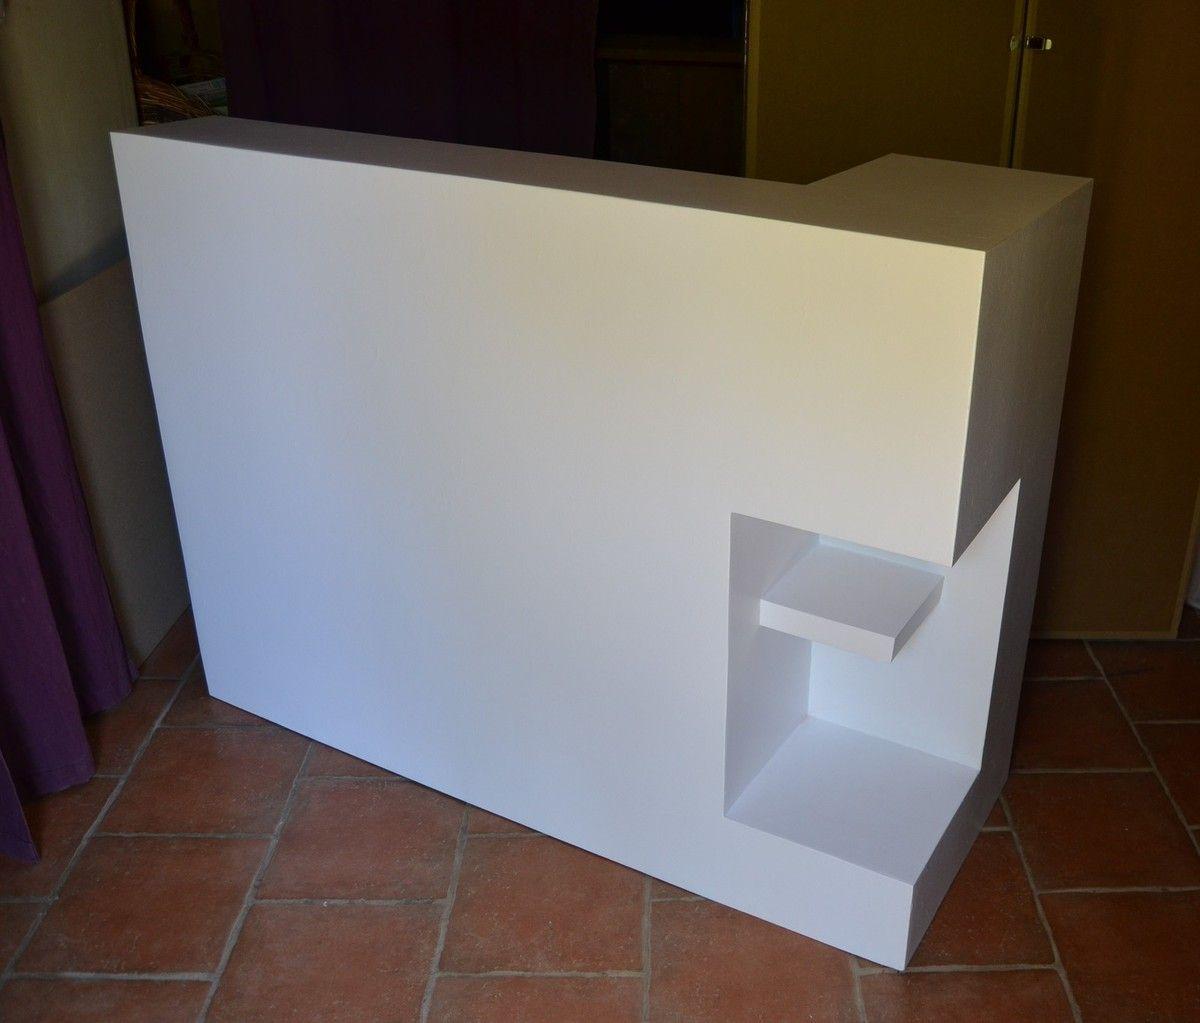 Meuble En Carton Comptoir Institut Sg Mobilier Carton Mobilier De Salon Carton Meubles En Carton